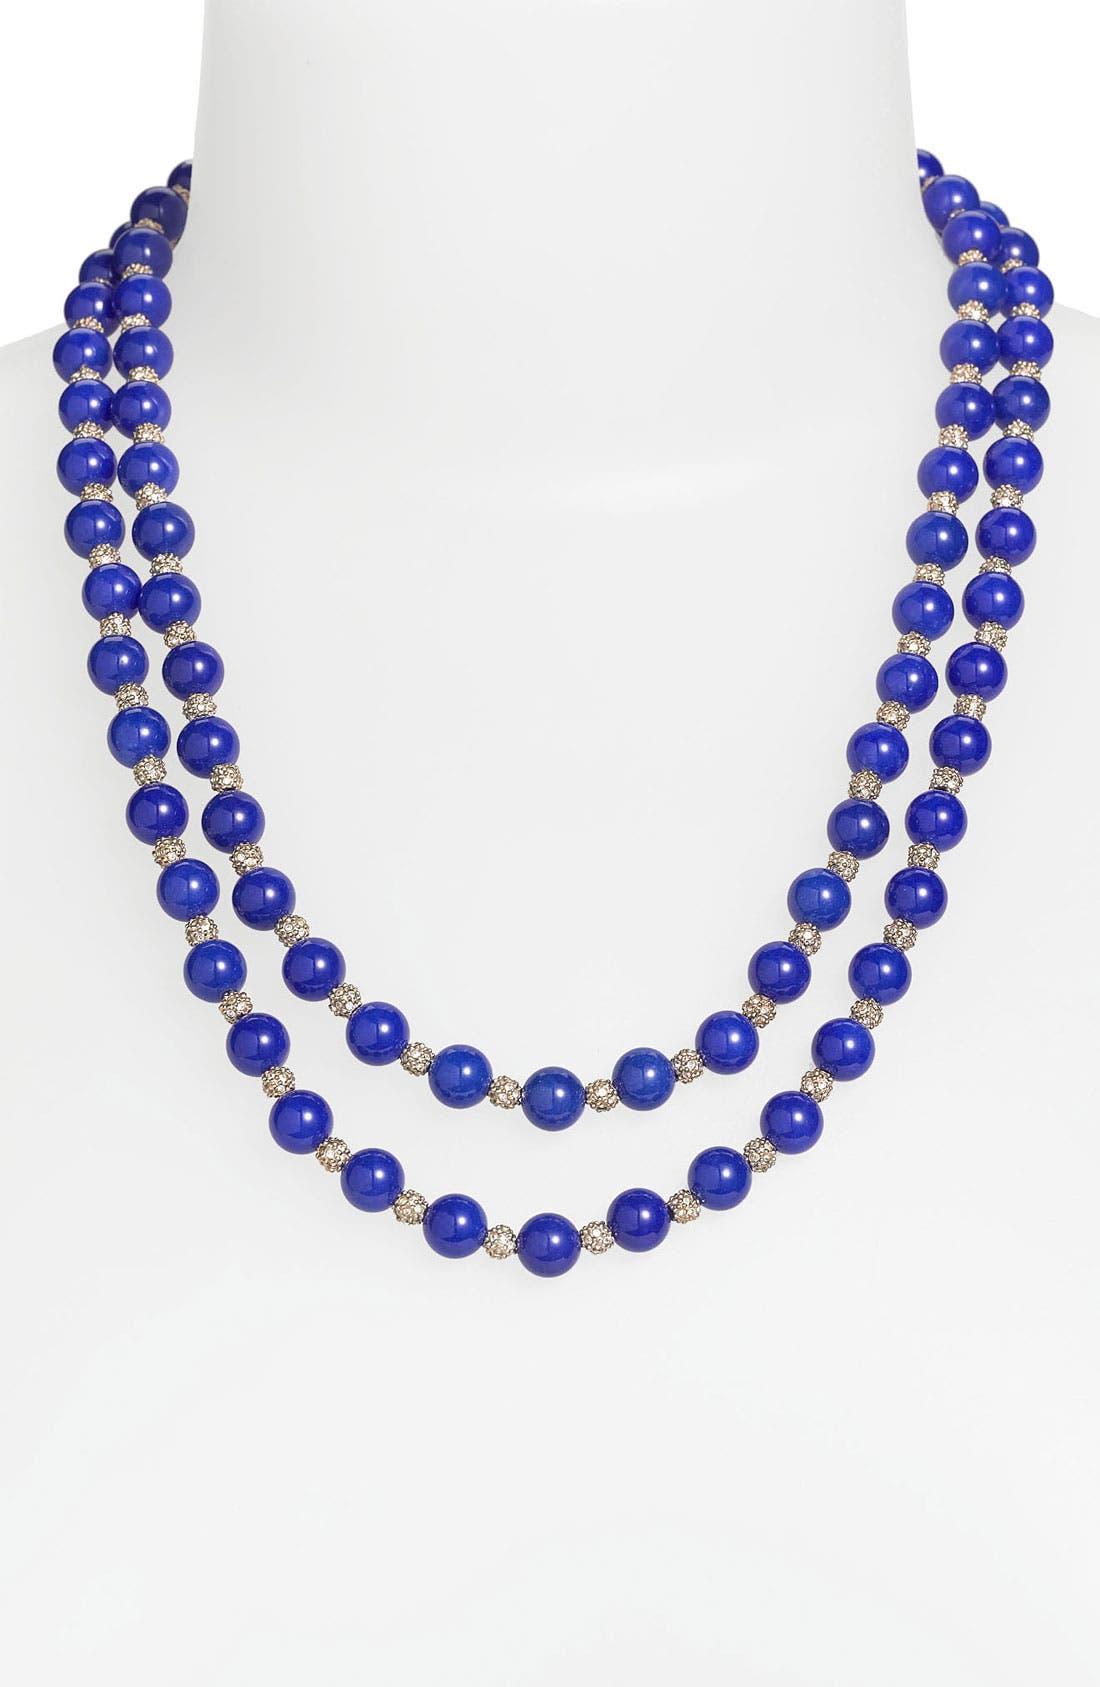 Main Image - St. John Collection Dyed Quartz Double Strand Necklace